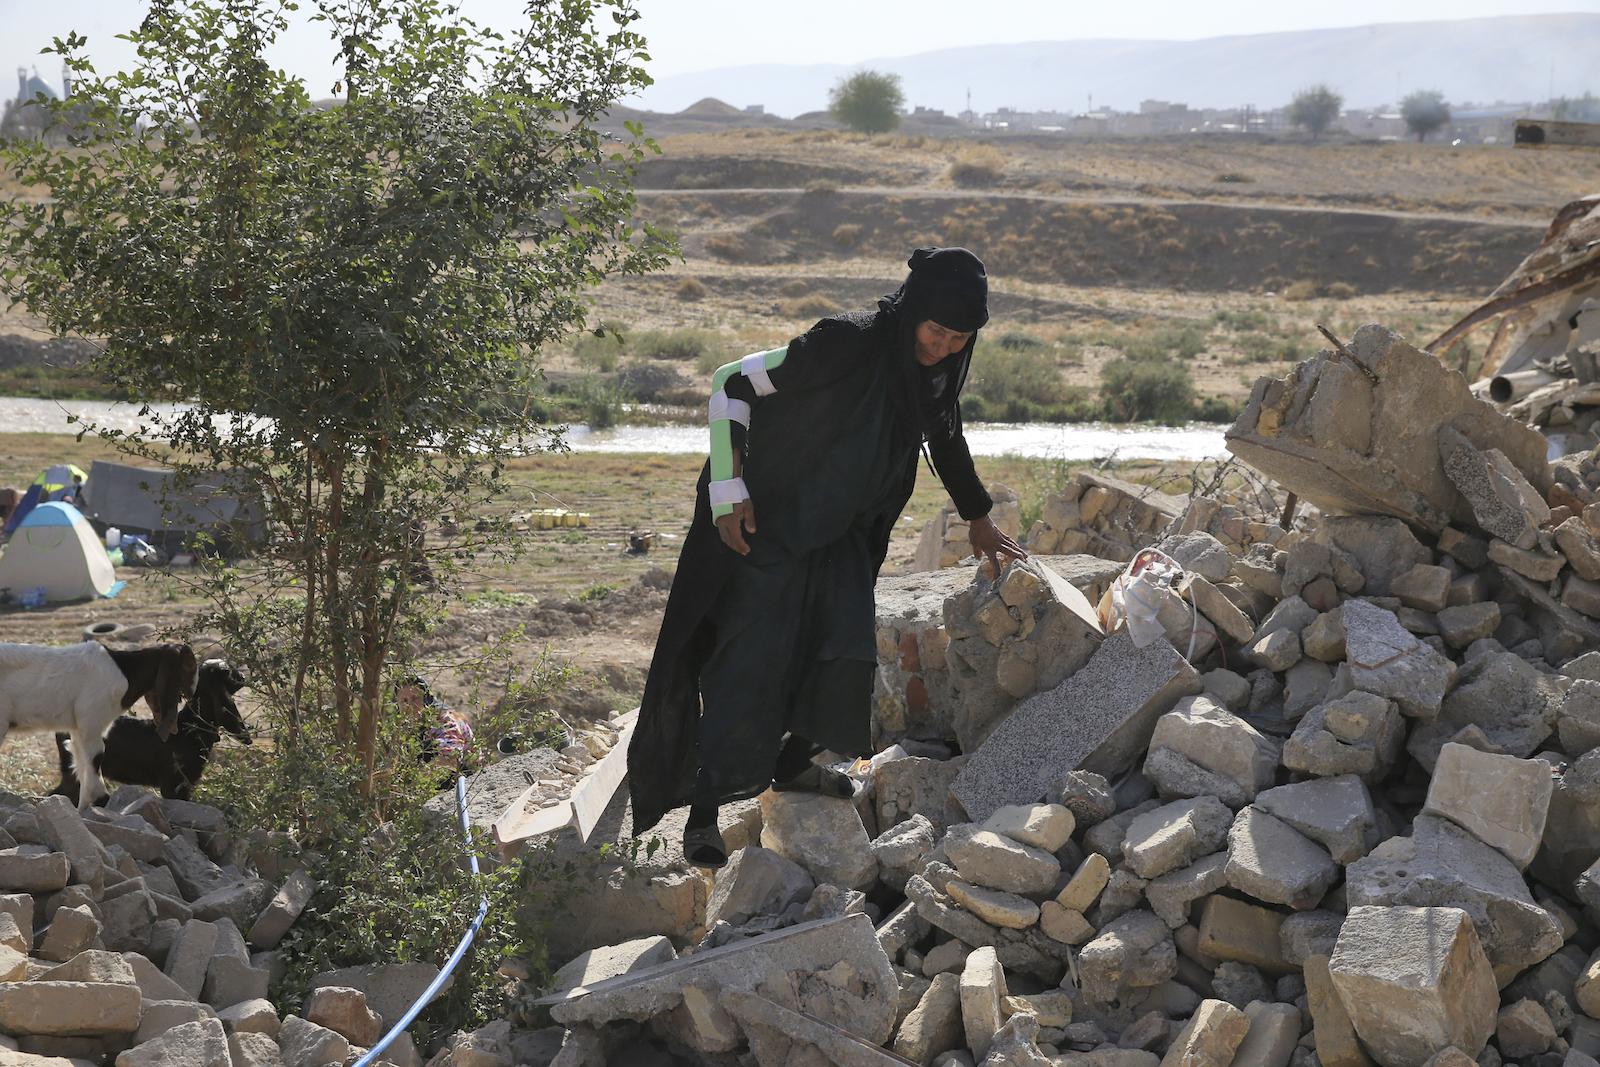 A survivor of the earthquake in Iran climbs over rubble